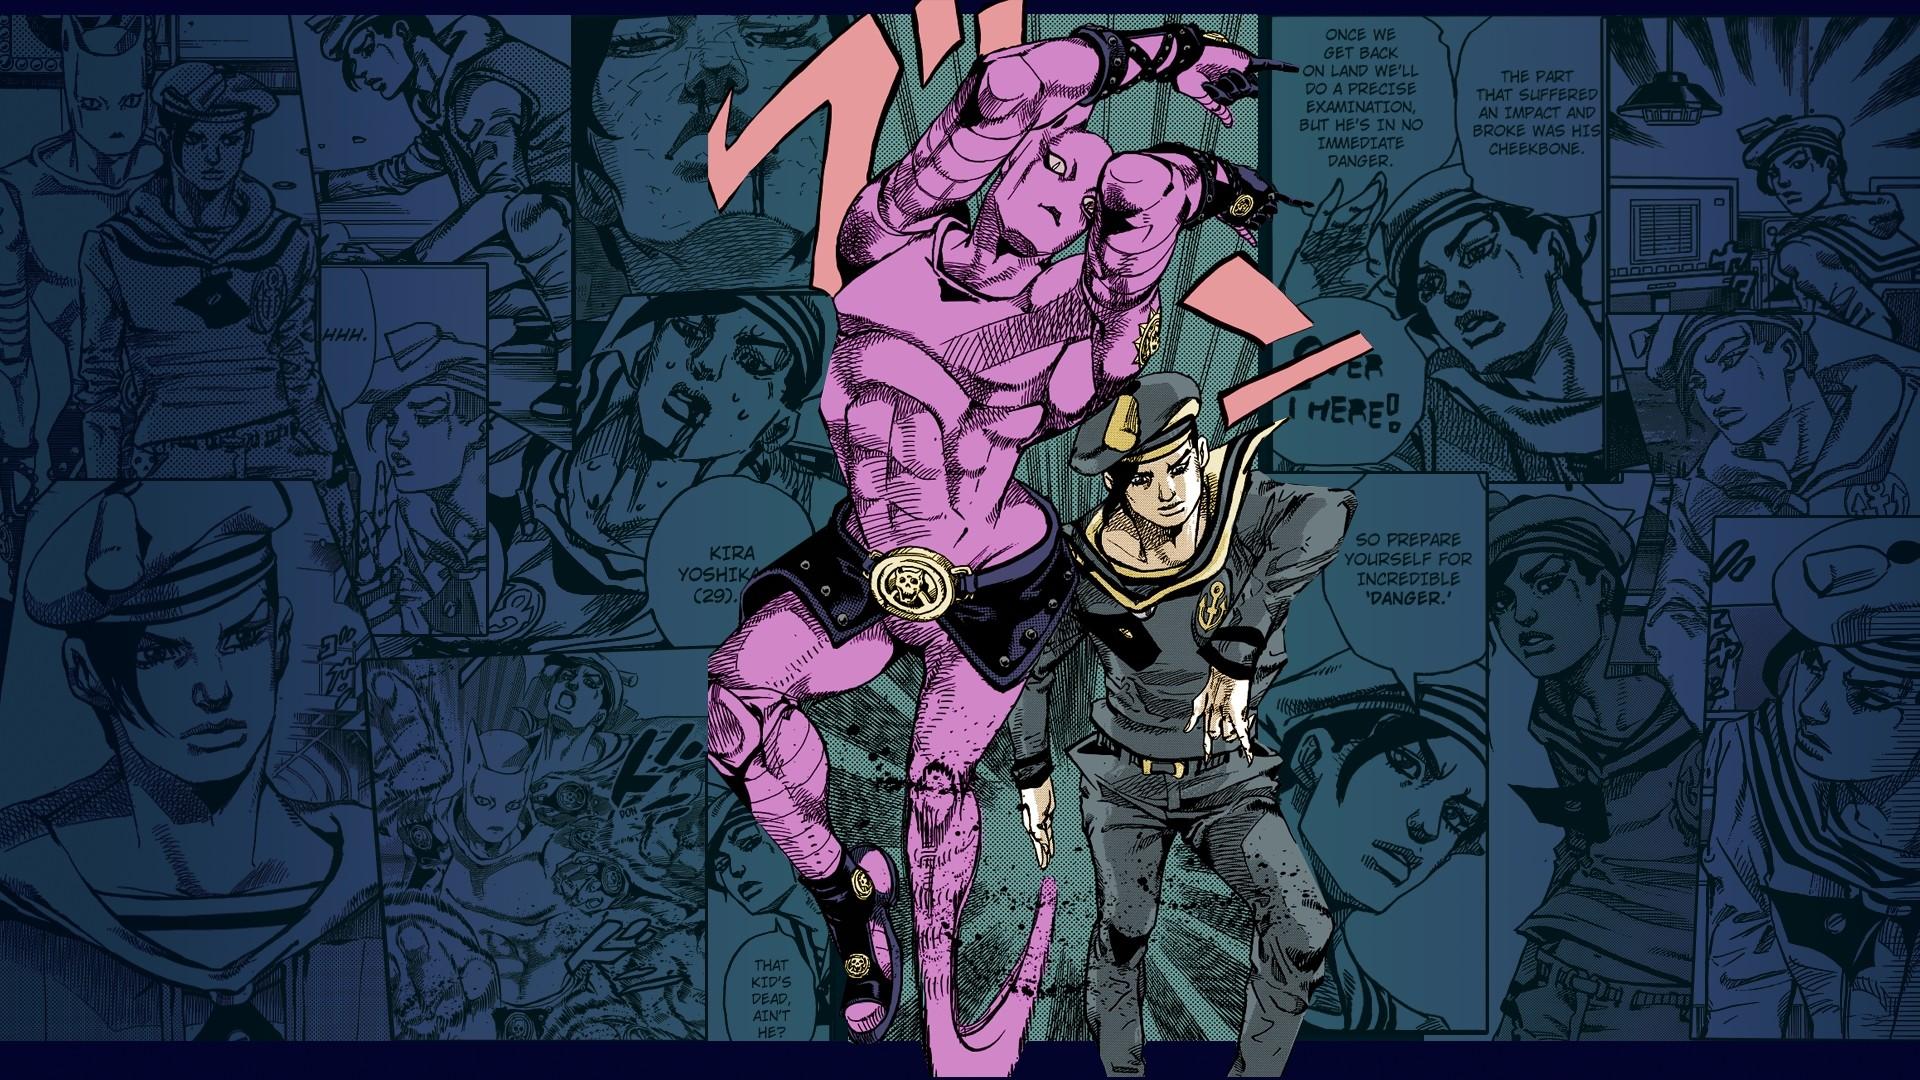 JoJo's Bizarre Adventure: Jojolion Kira Yoshikage Panel Wallpaper